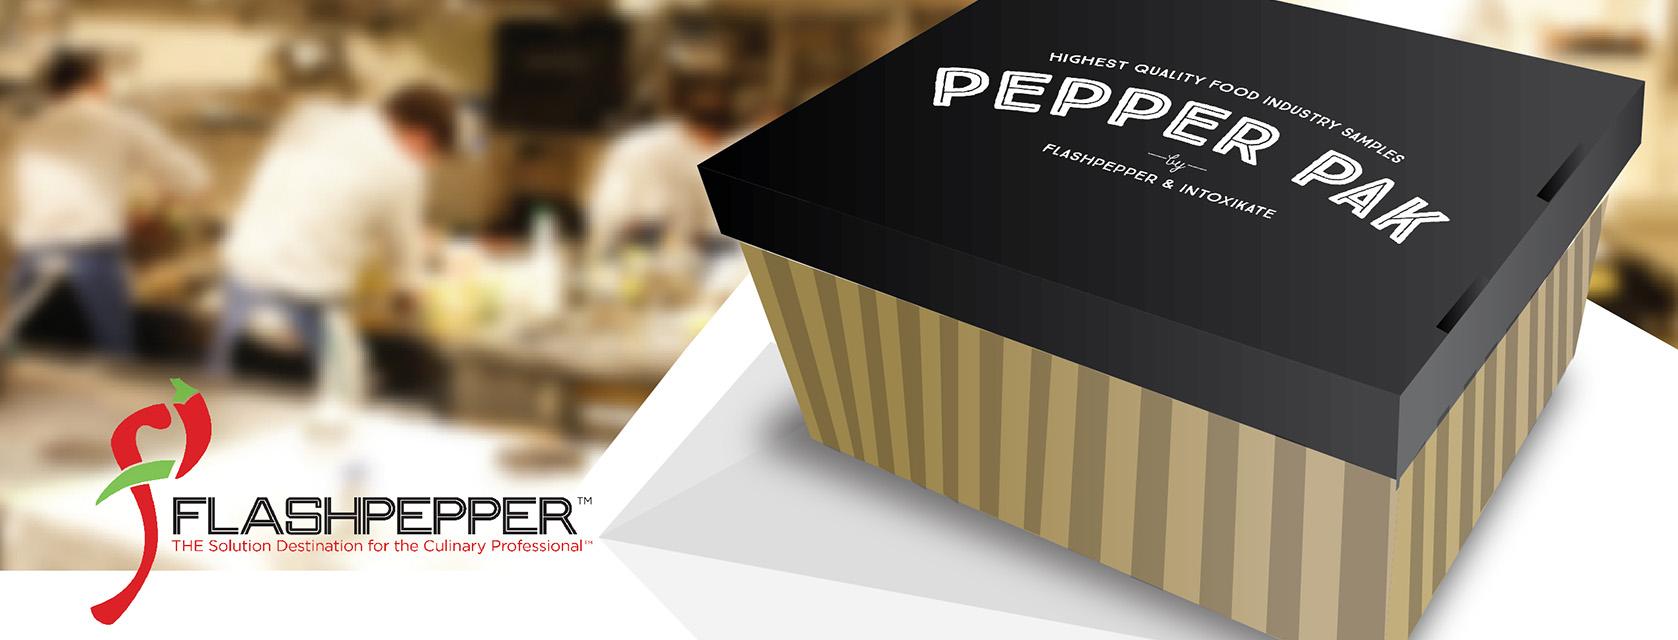 pepper pak